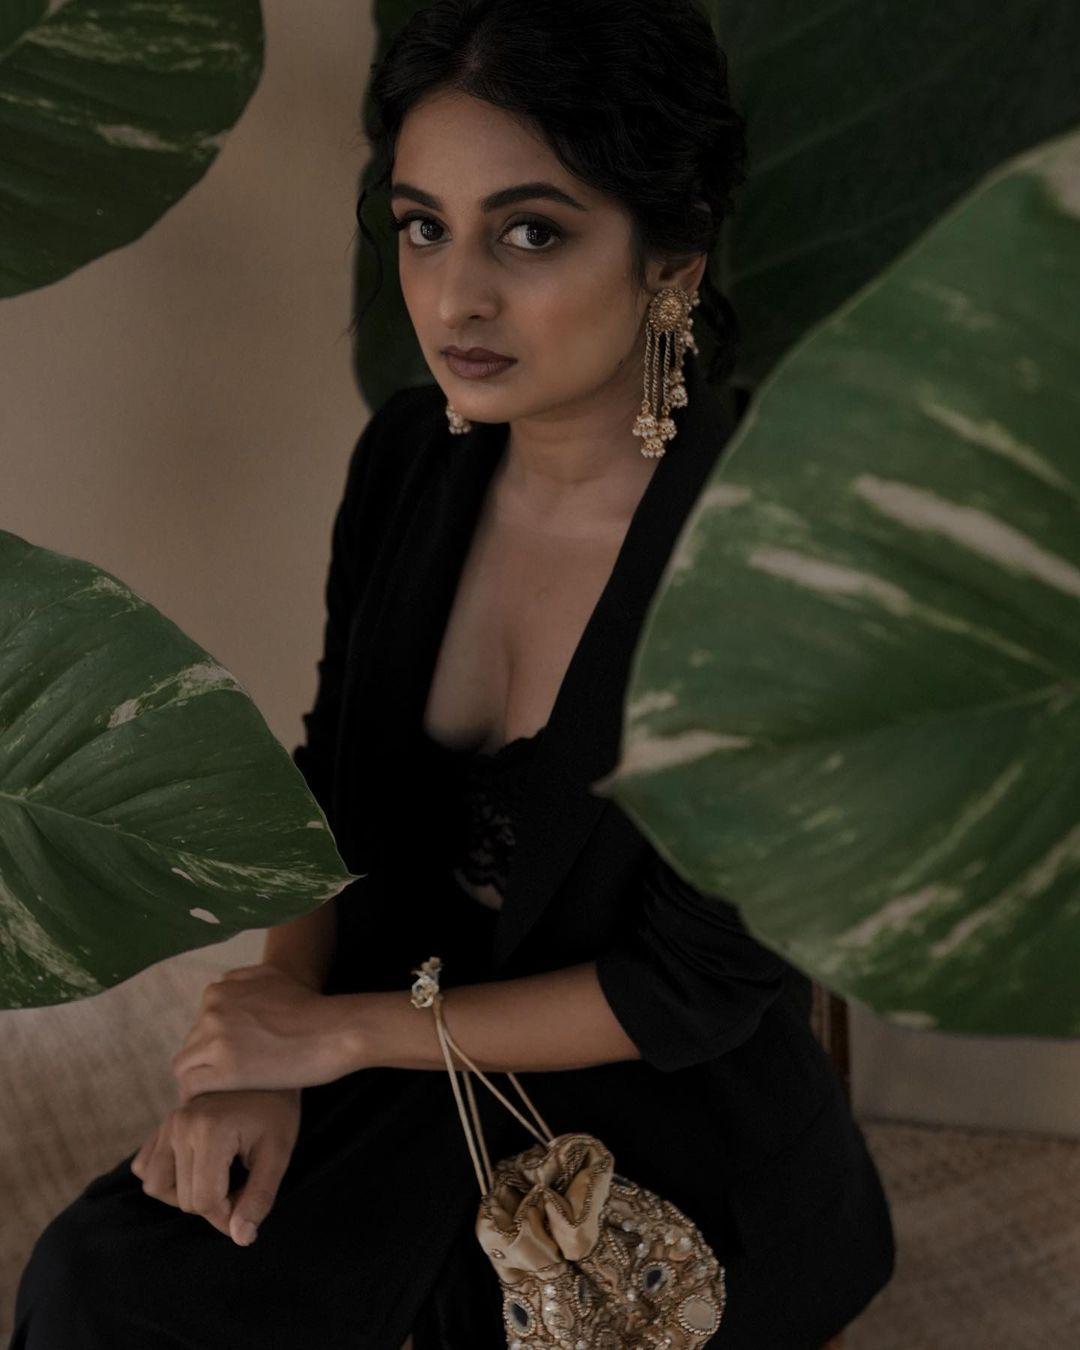 Esther-Anil-Sexy-Photoshoot-4